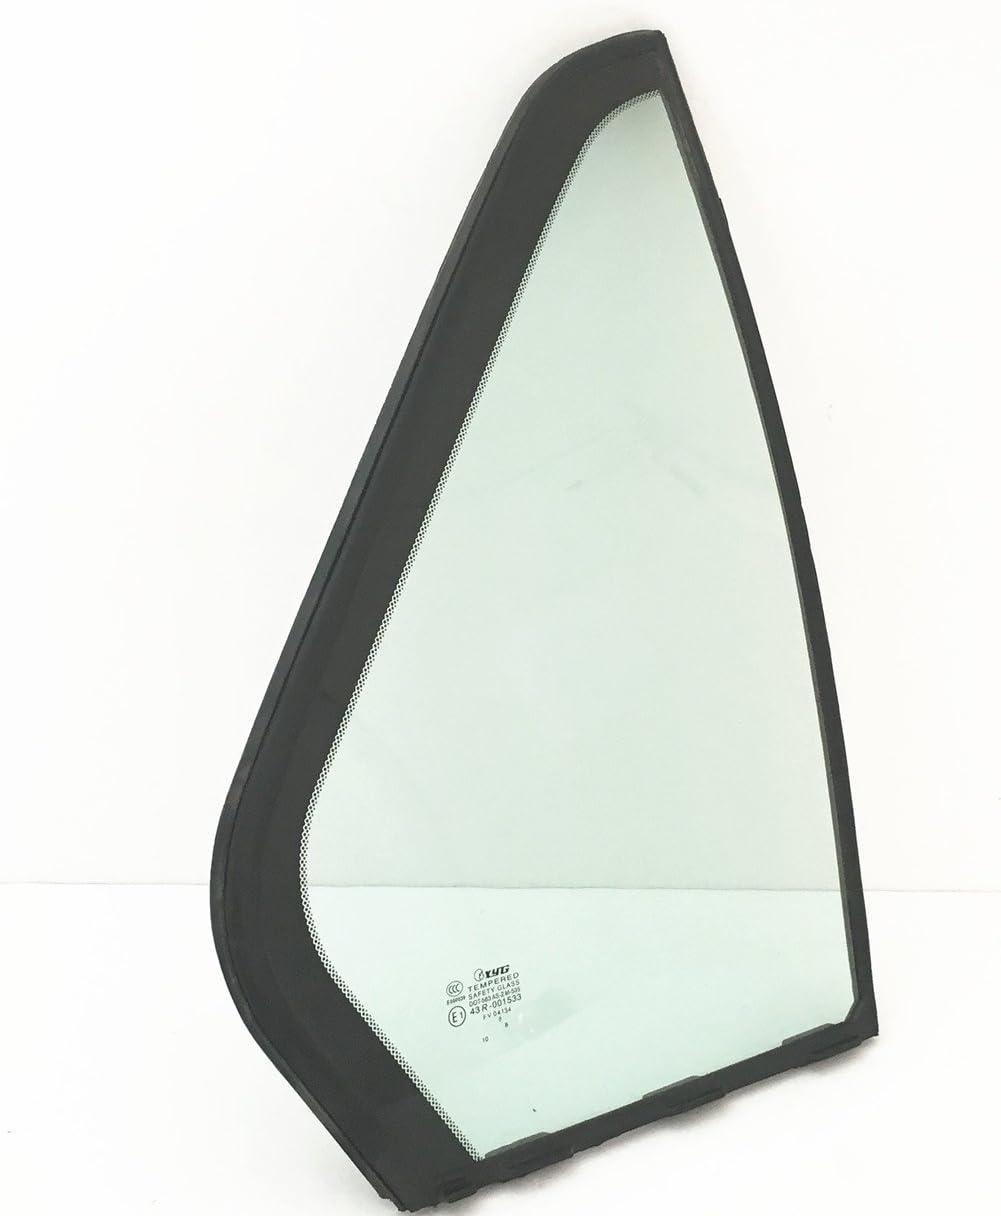 NAGD Compatible with 1990-1993 Honda Accord 4 Door Sedan Passenger Right Side Rear Vent Window Glass